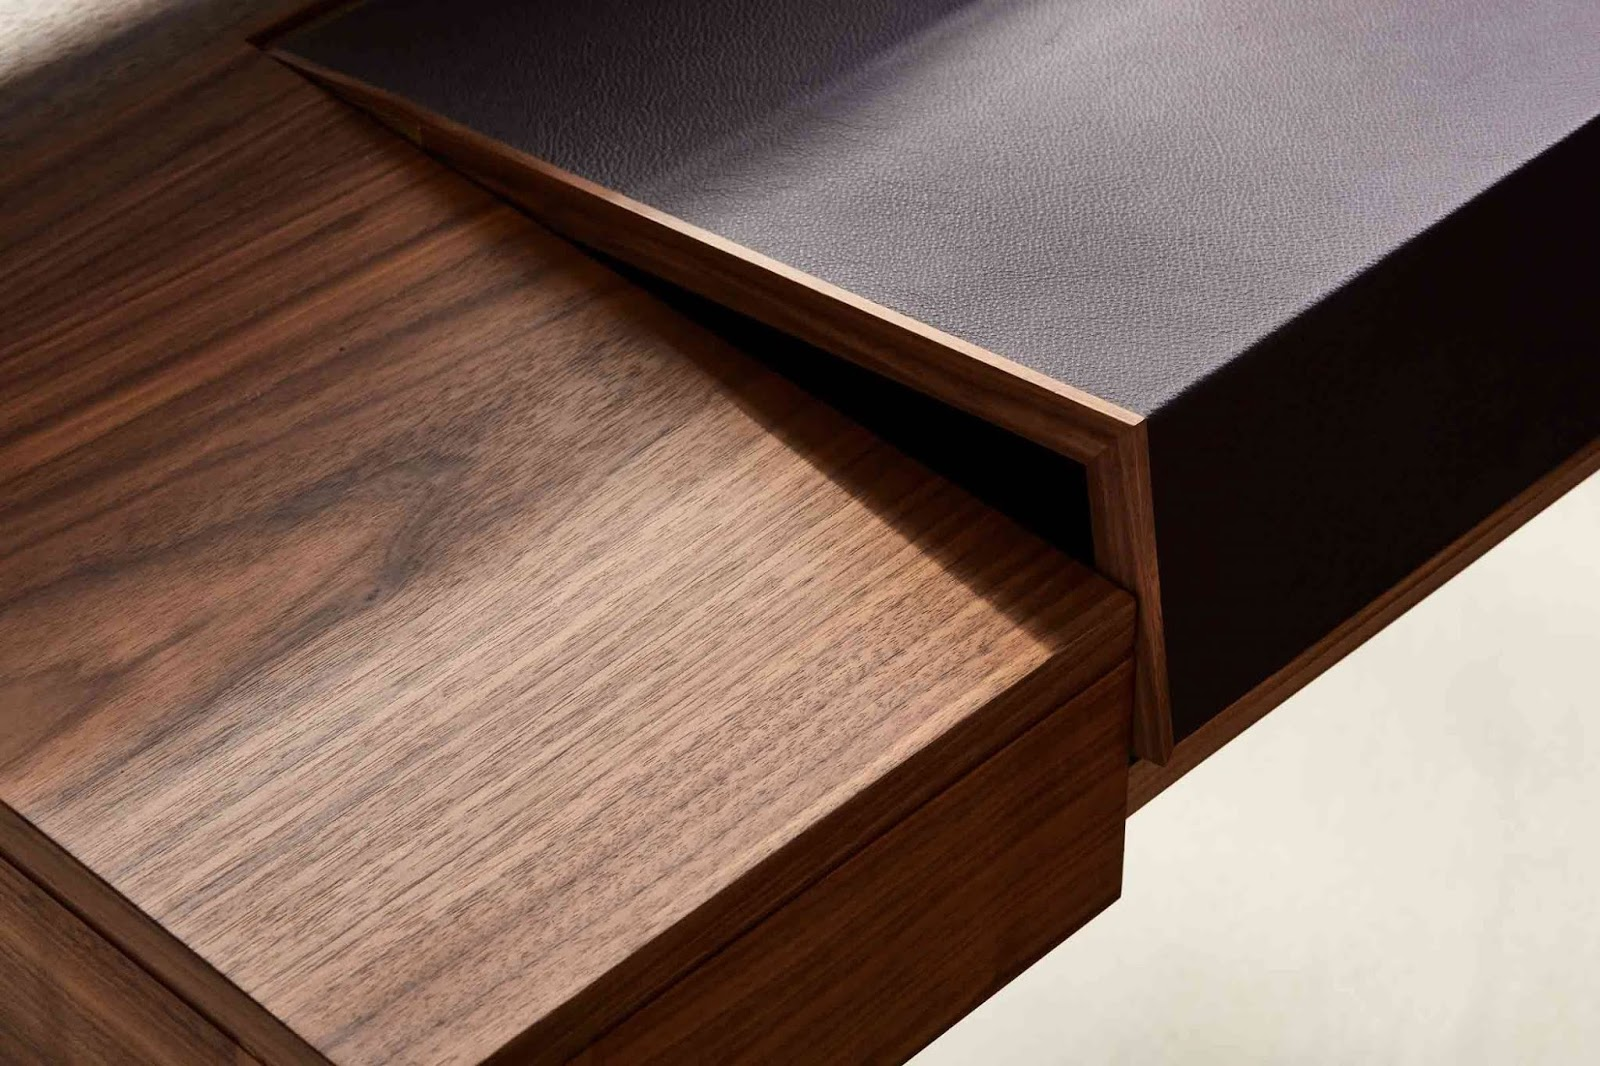 Solidne biurko z drewna